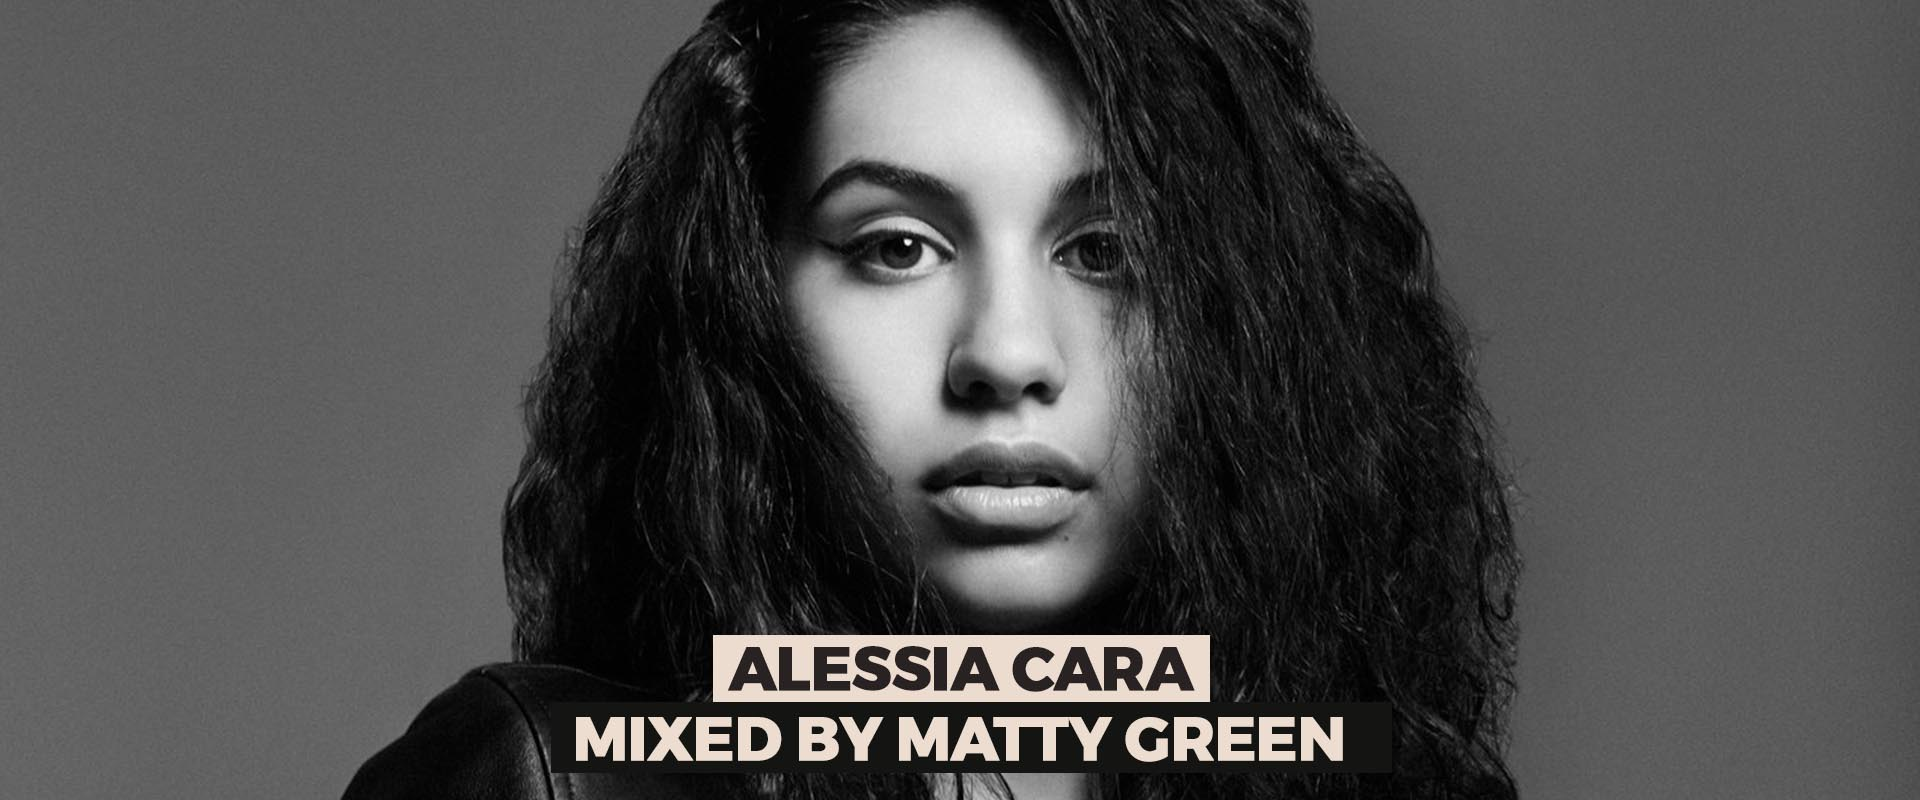 Alessia Cara Mixer